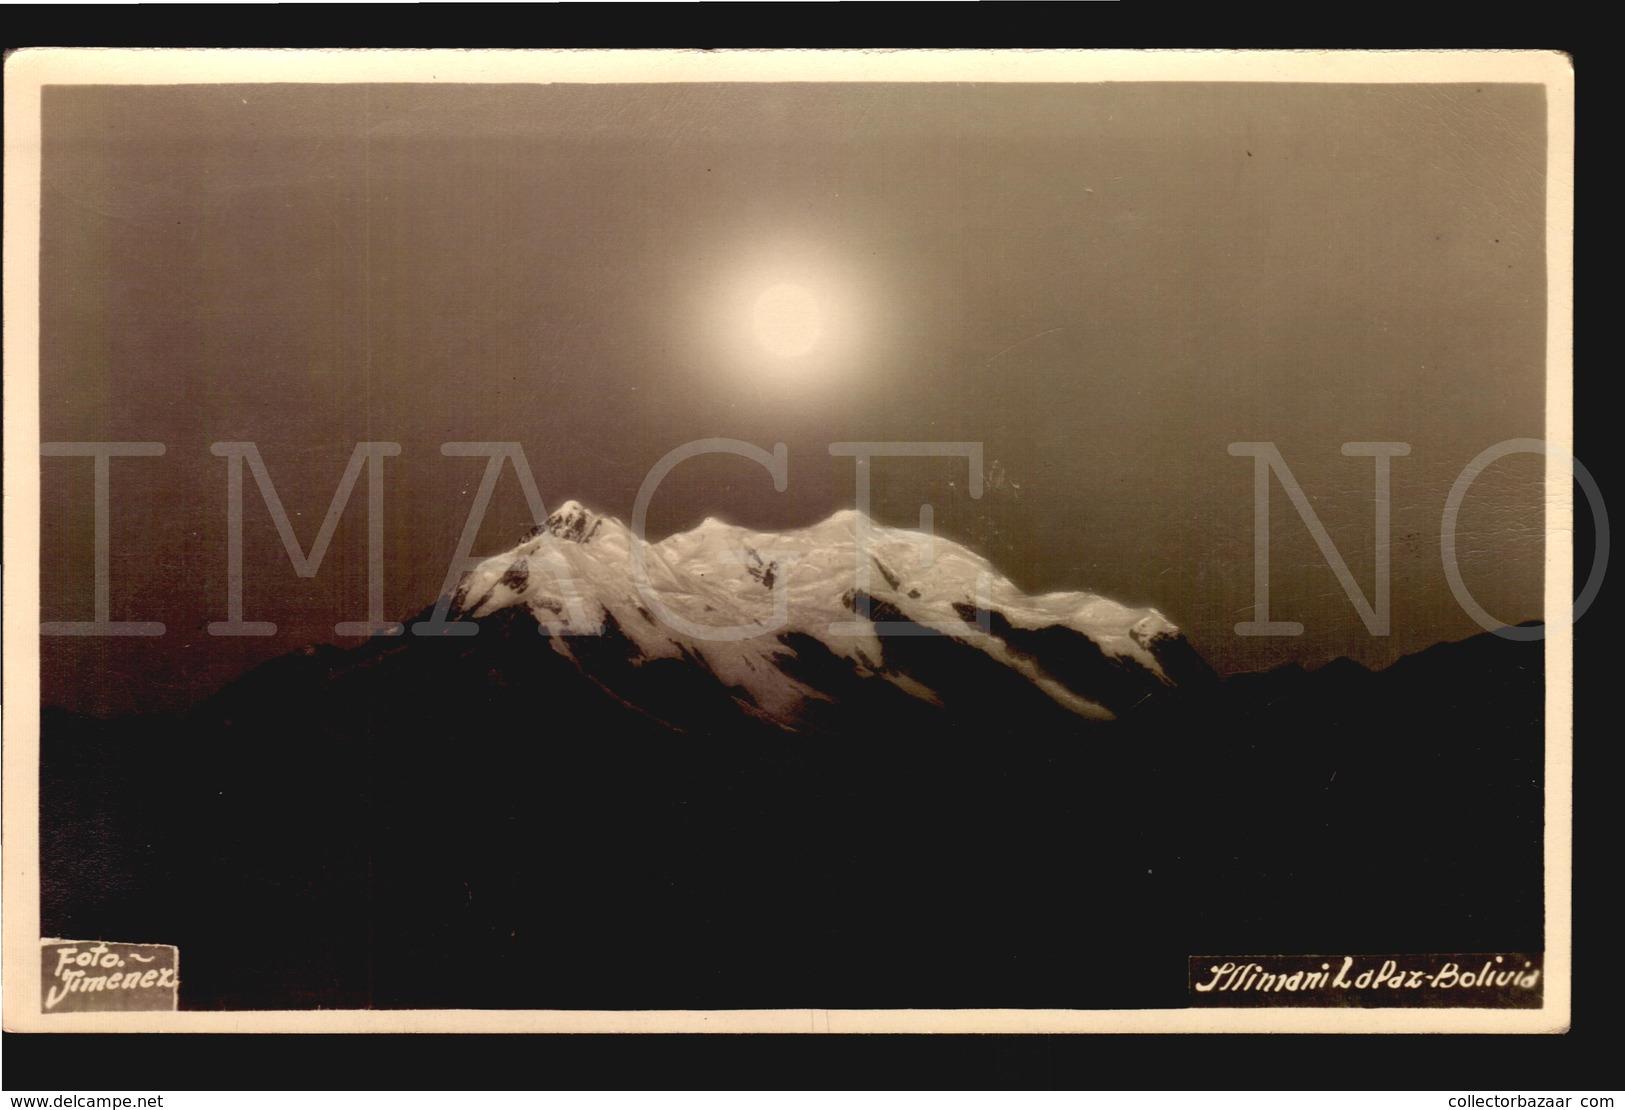 Bolivia ETHNIC ORIGINAL CA 1940 REAL PHOTO POSTCARDS Illimani La Paz Mountain Illuminated By Sun Or Moon (w5-103) - Bolivia